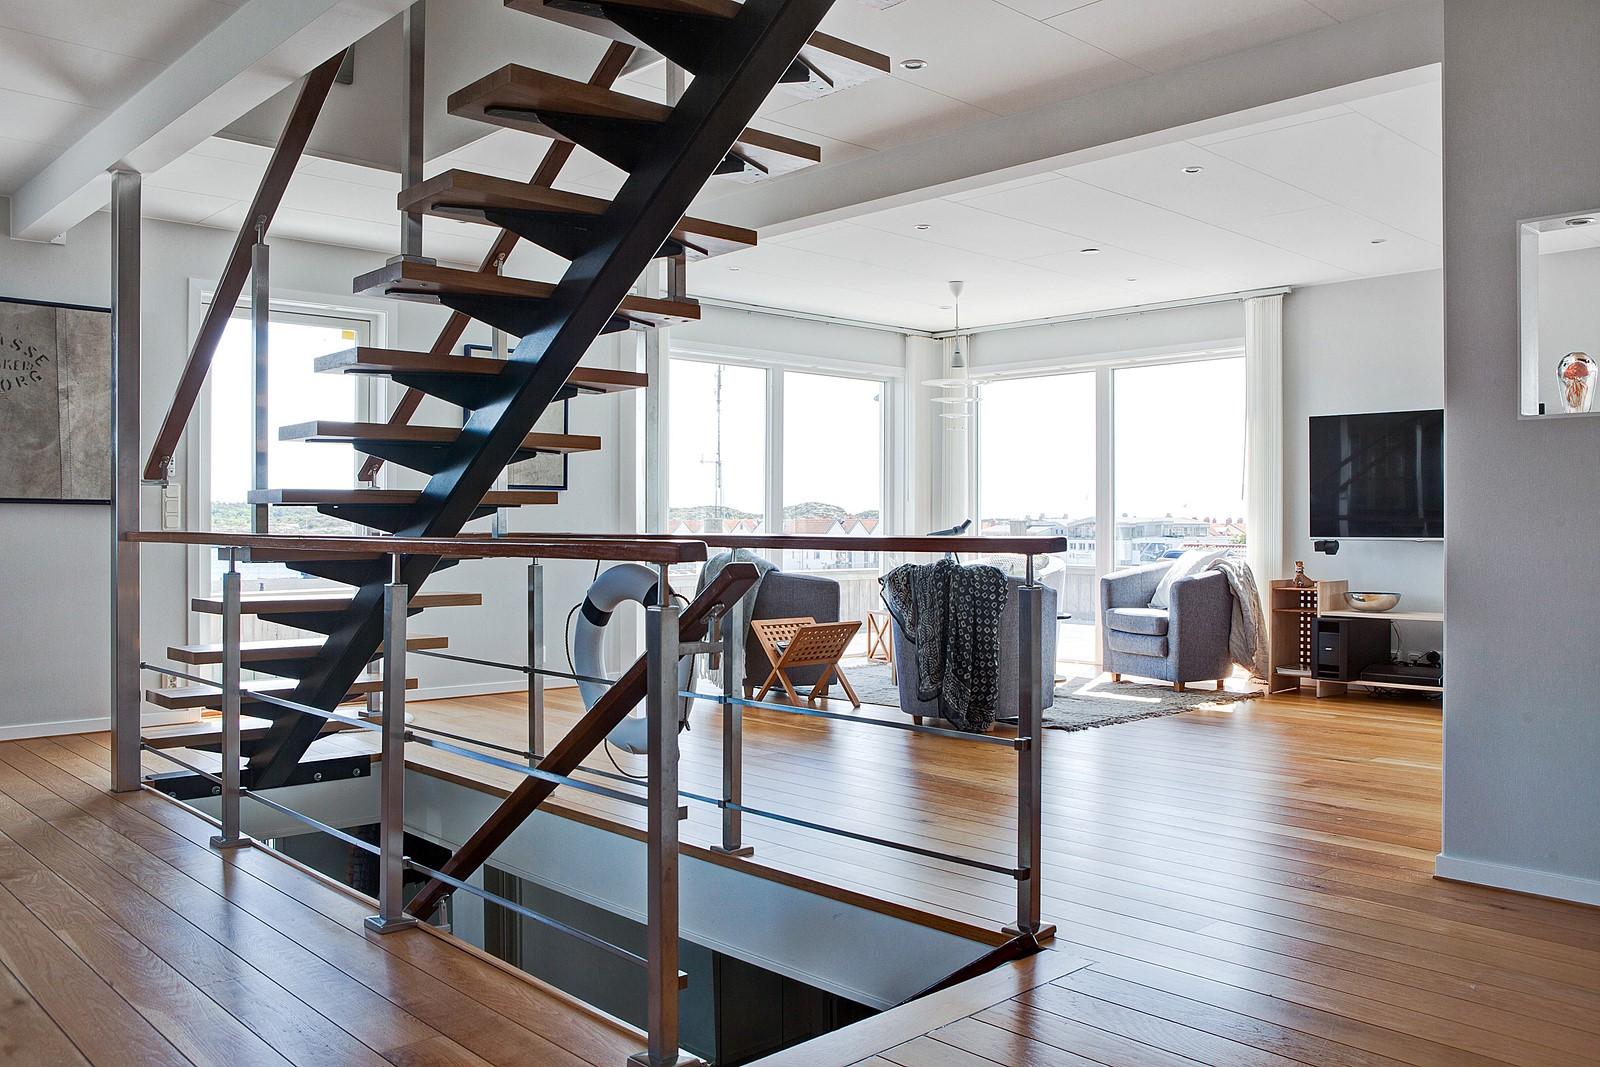 гостиная панорамные окна лестница